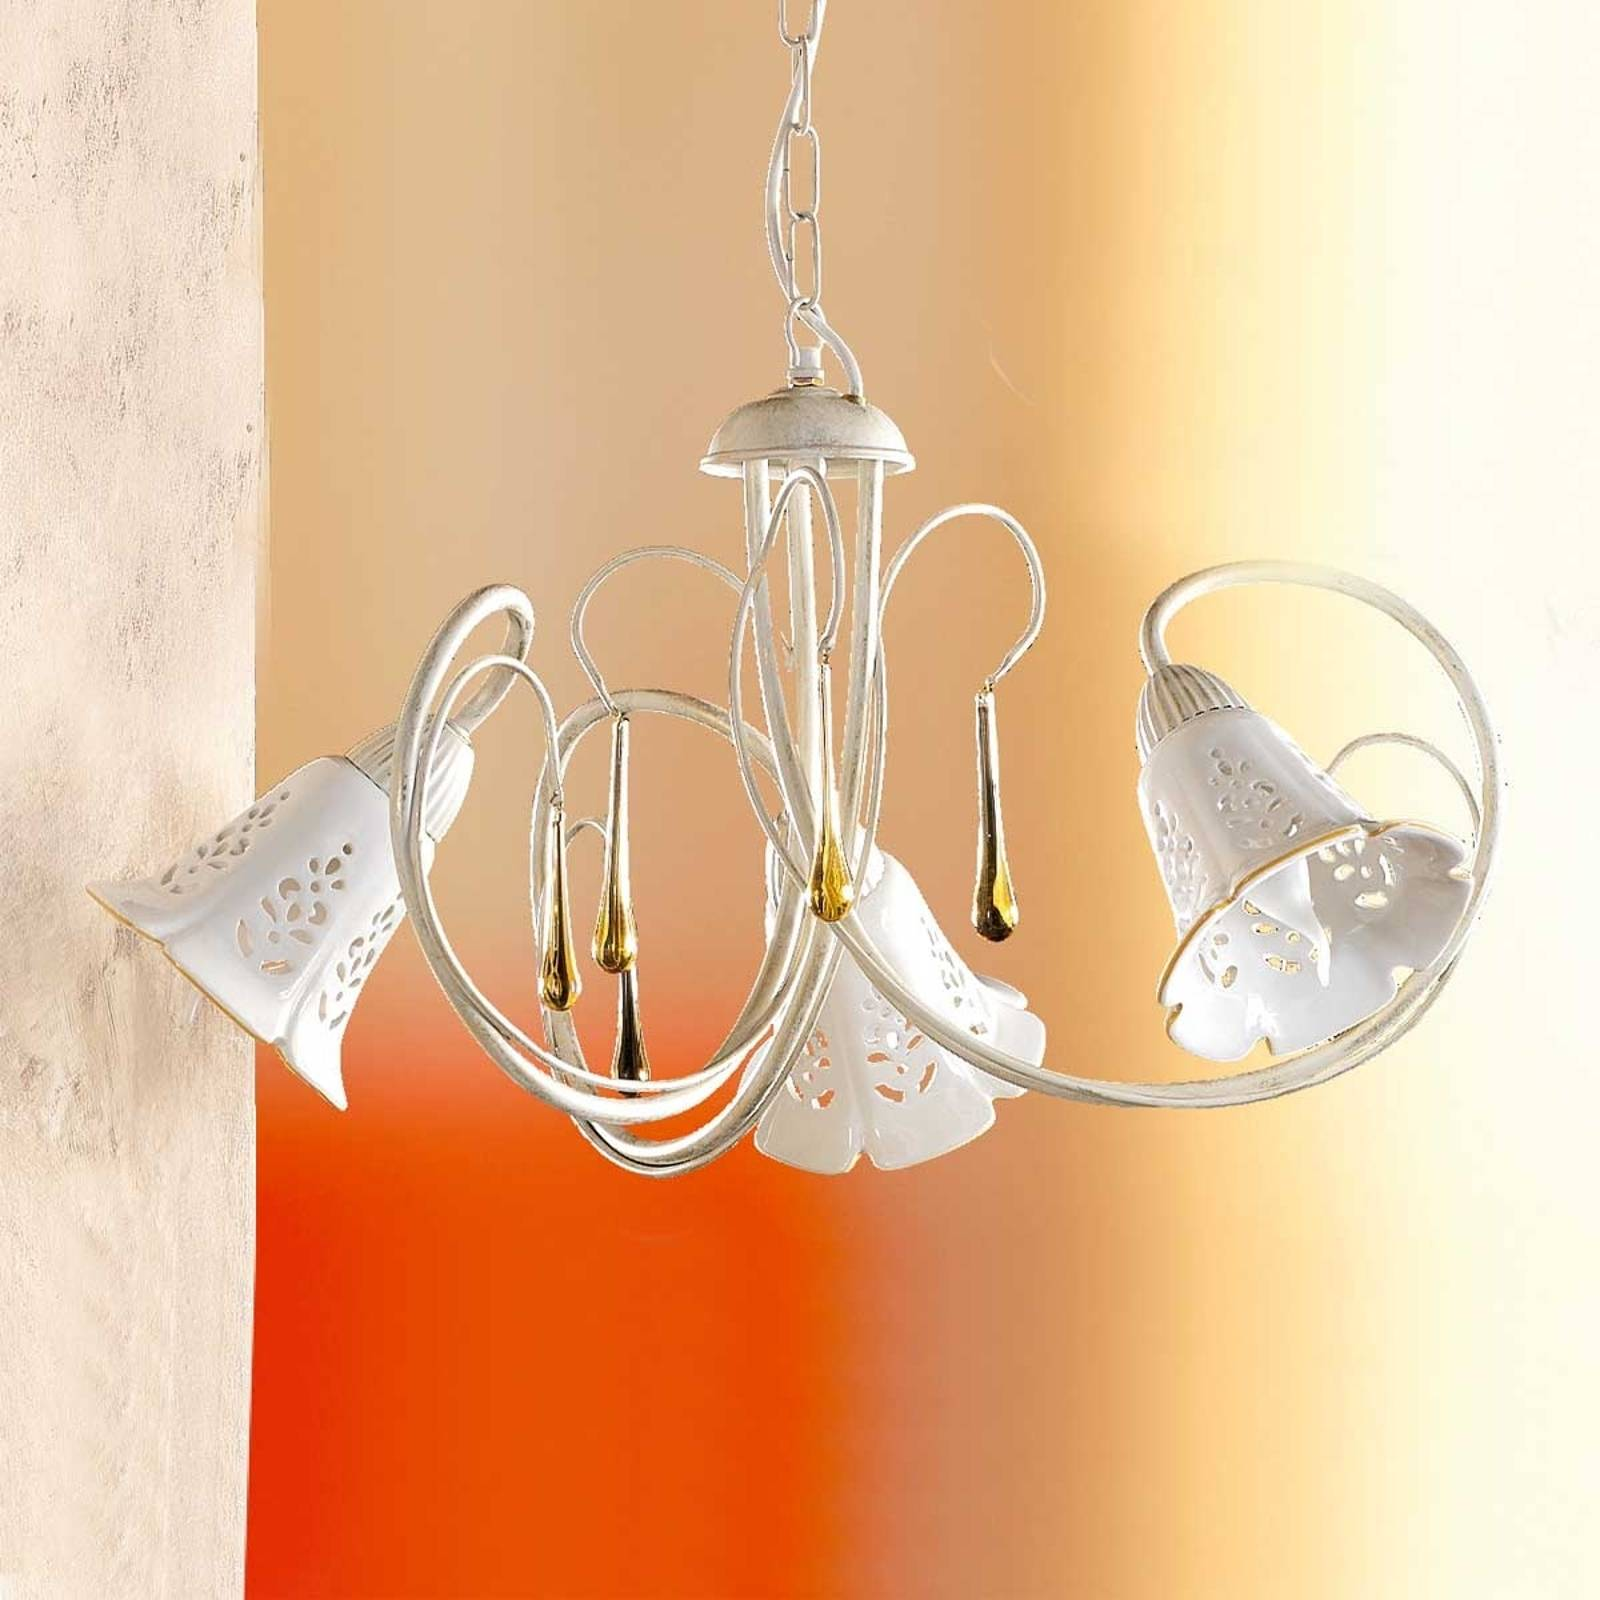 Hanglamp GOCCE, 3-lichts